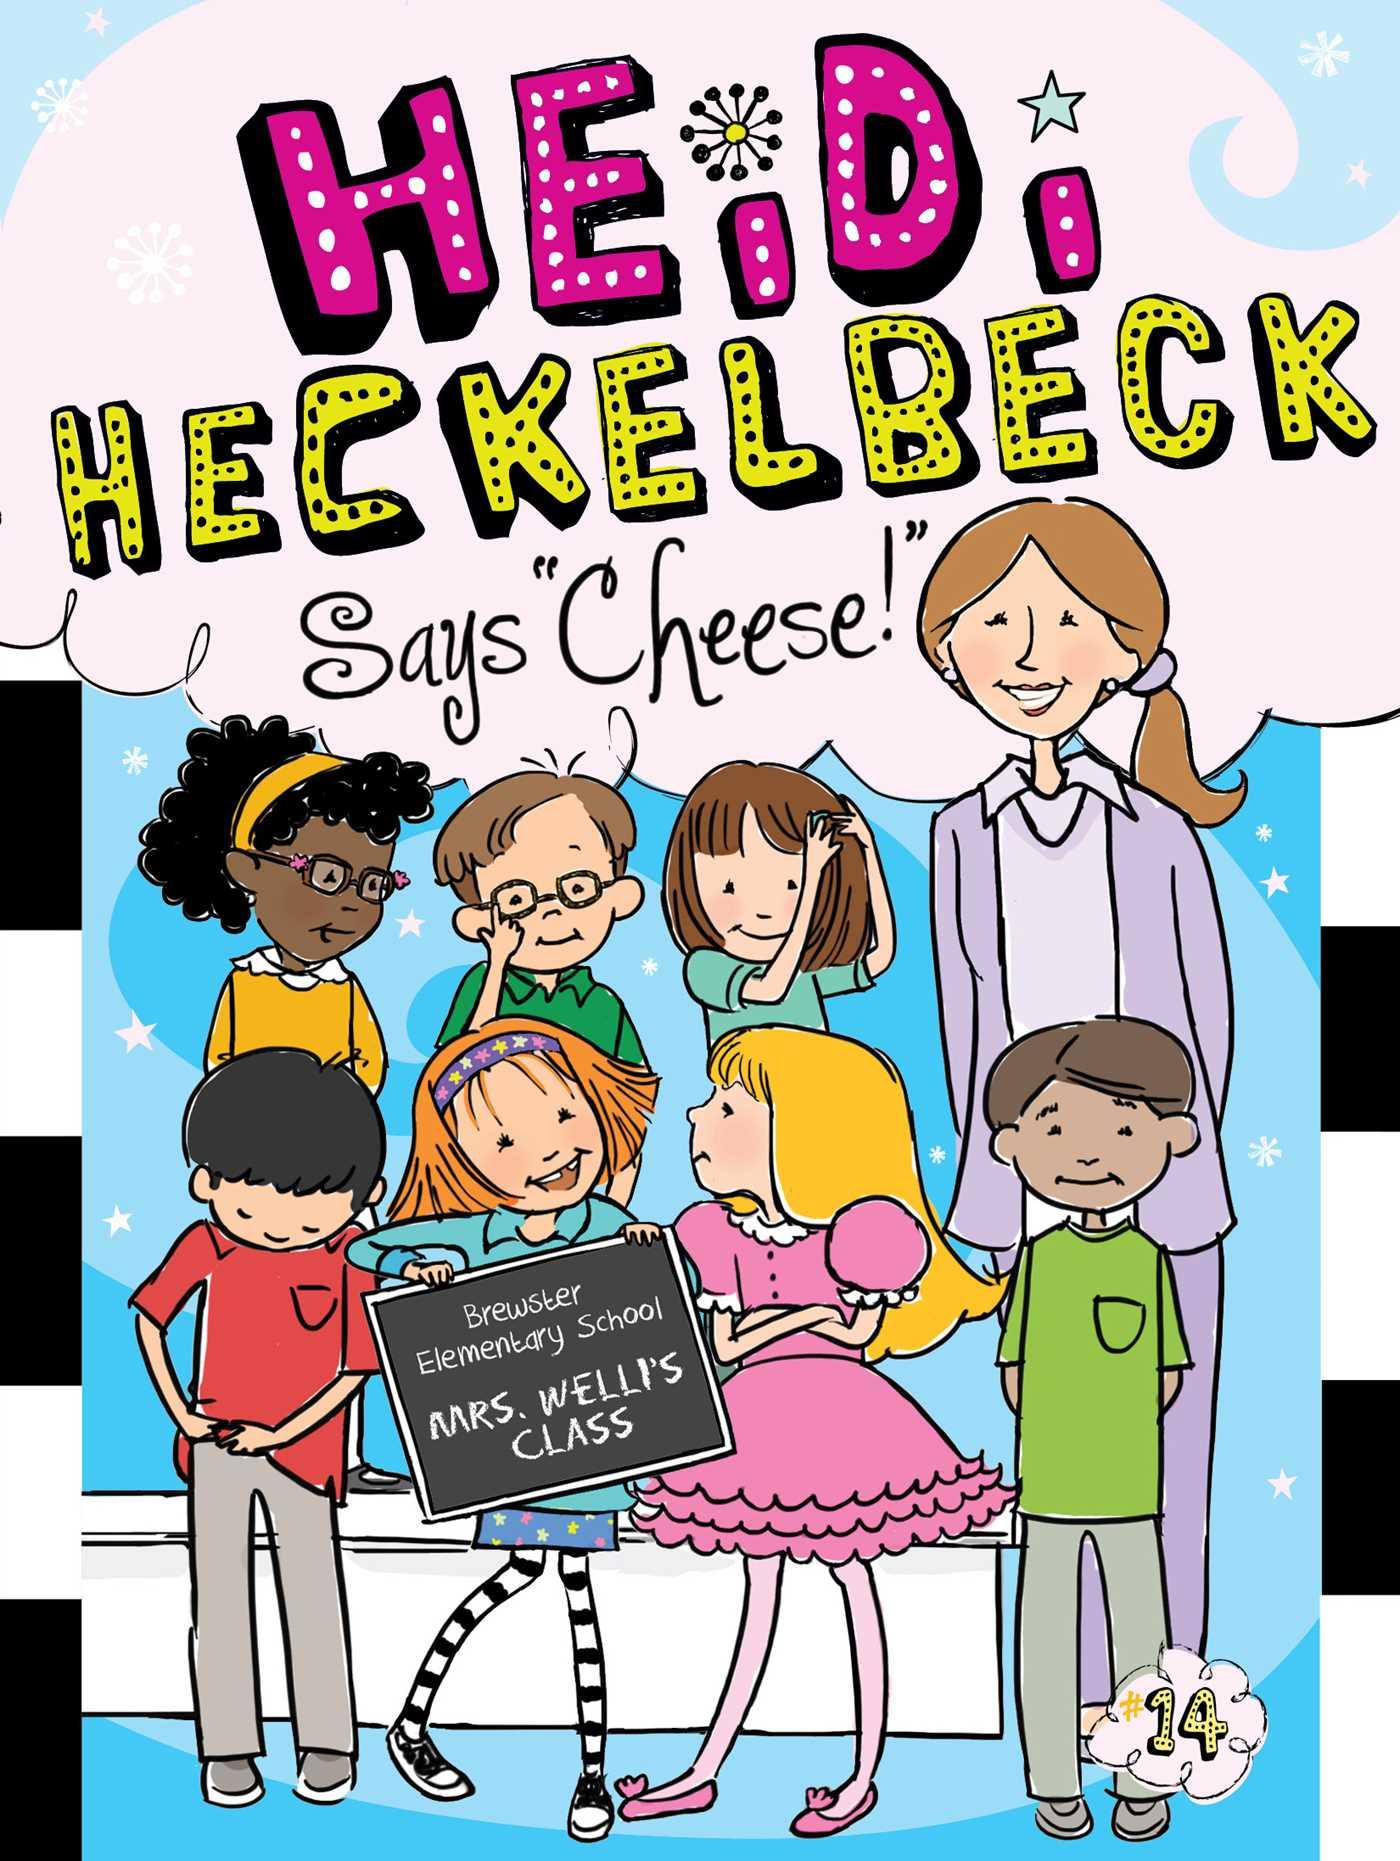 Heidi heckelbeck says cheese 9781481423274 hr